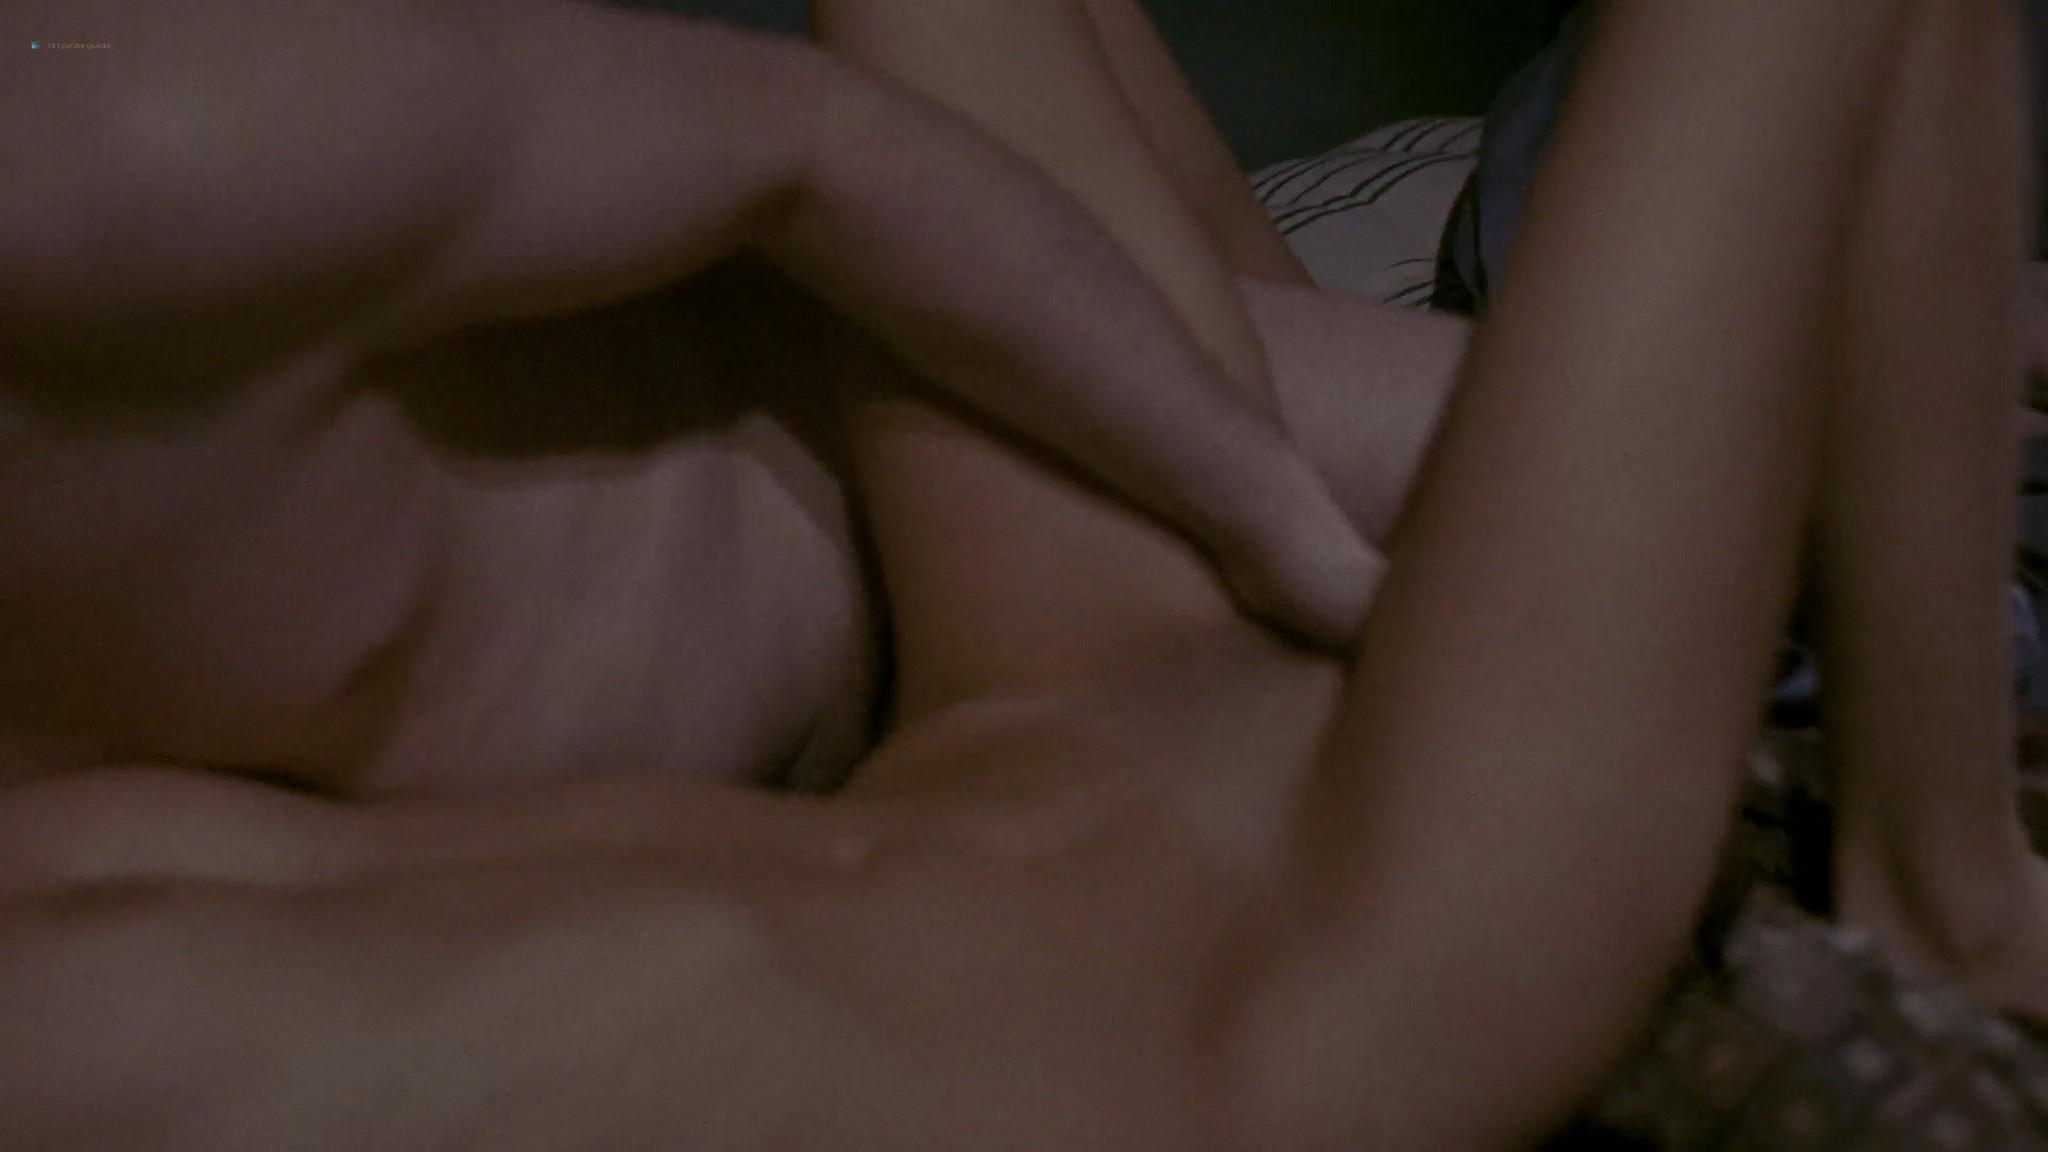 Ekaterina Yuspina nude explicit sex Tatyana Polozhiy, Radmila Shegoleva nude sex too - DAU Katya Tanya (2020) HD 1080p (9)